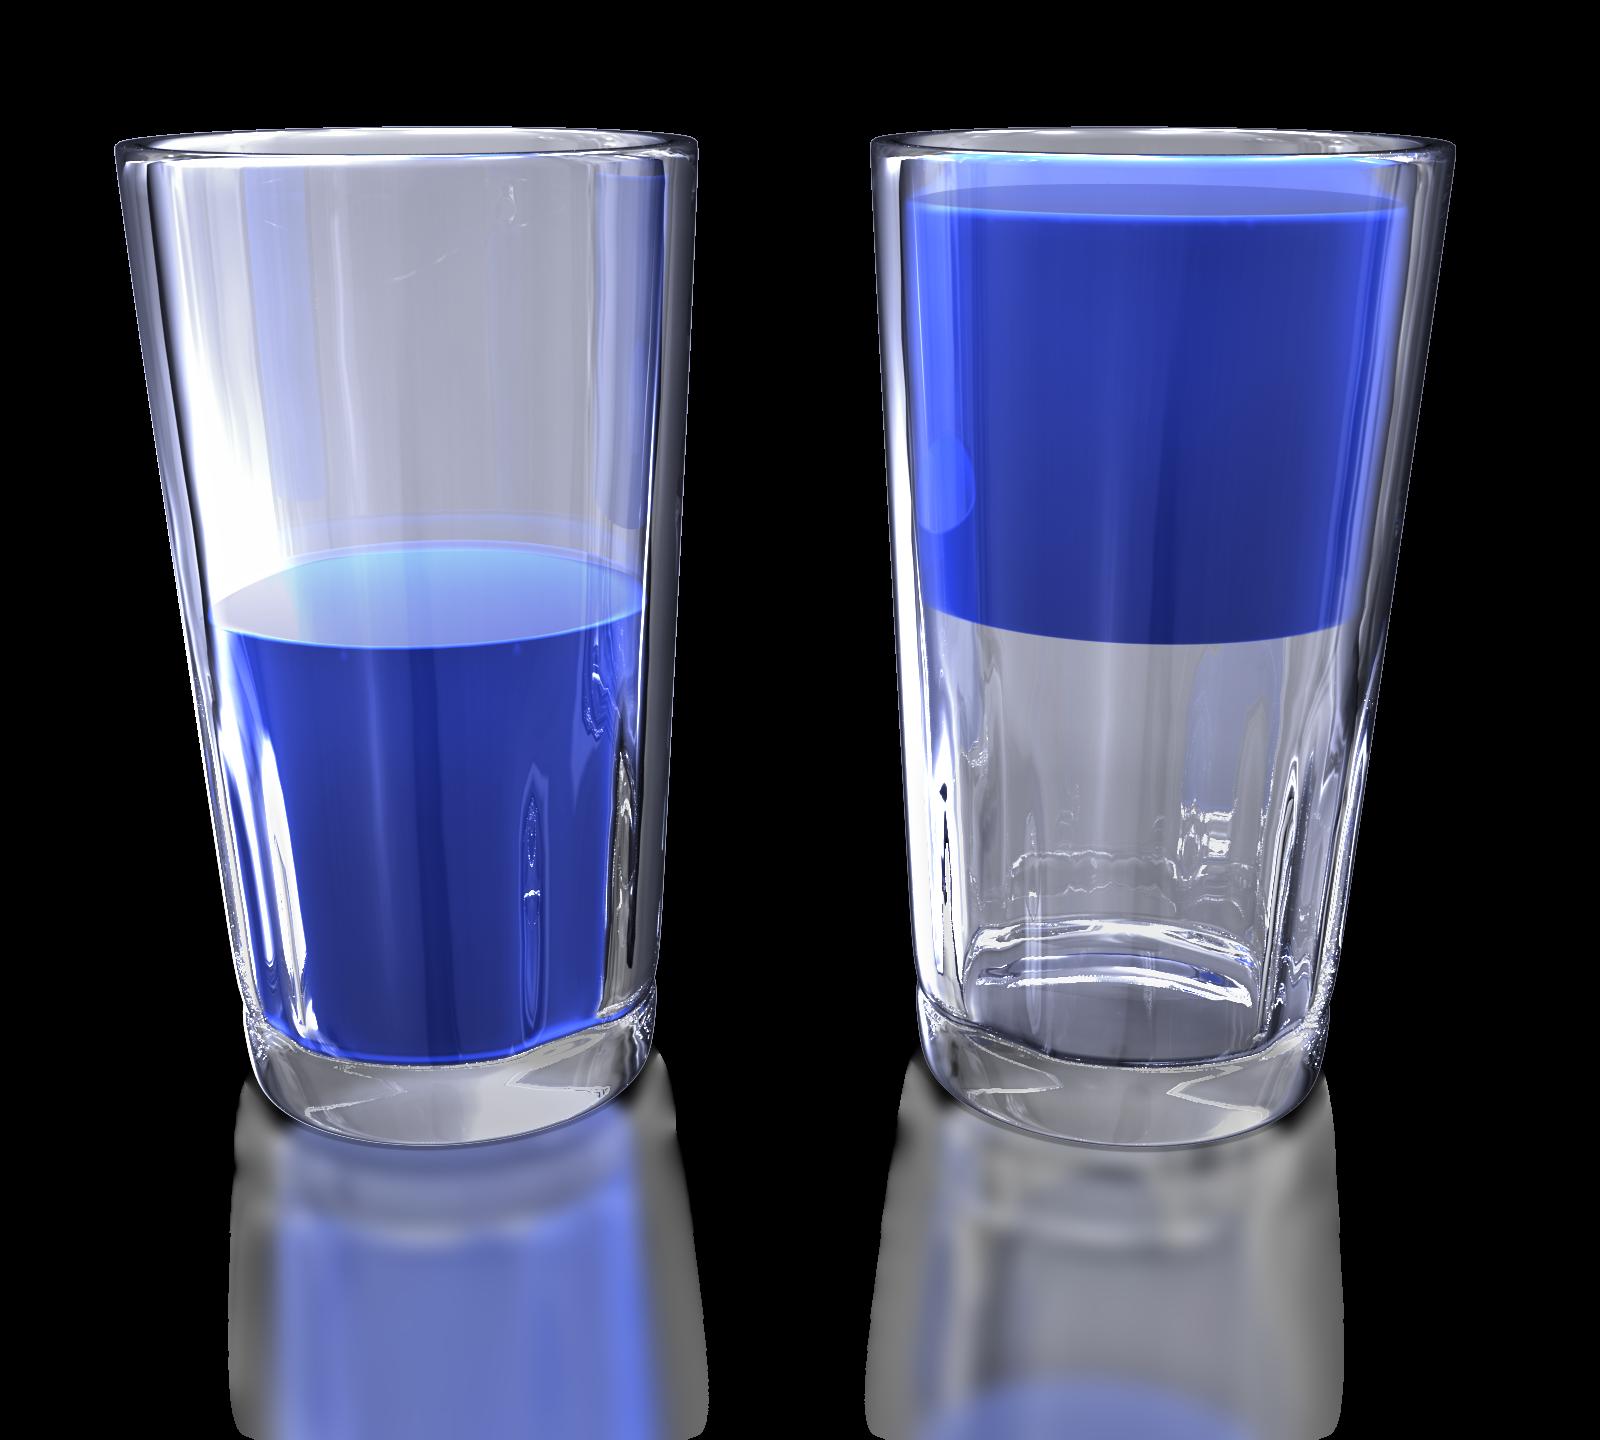 Shot clipart glass tumbler. Half full or empty